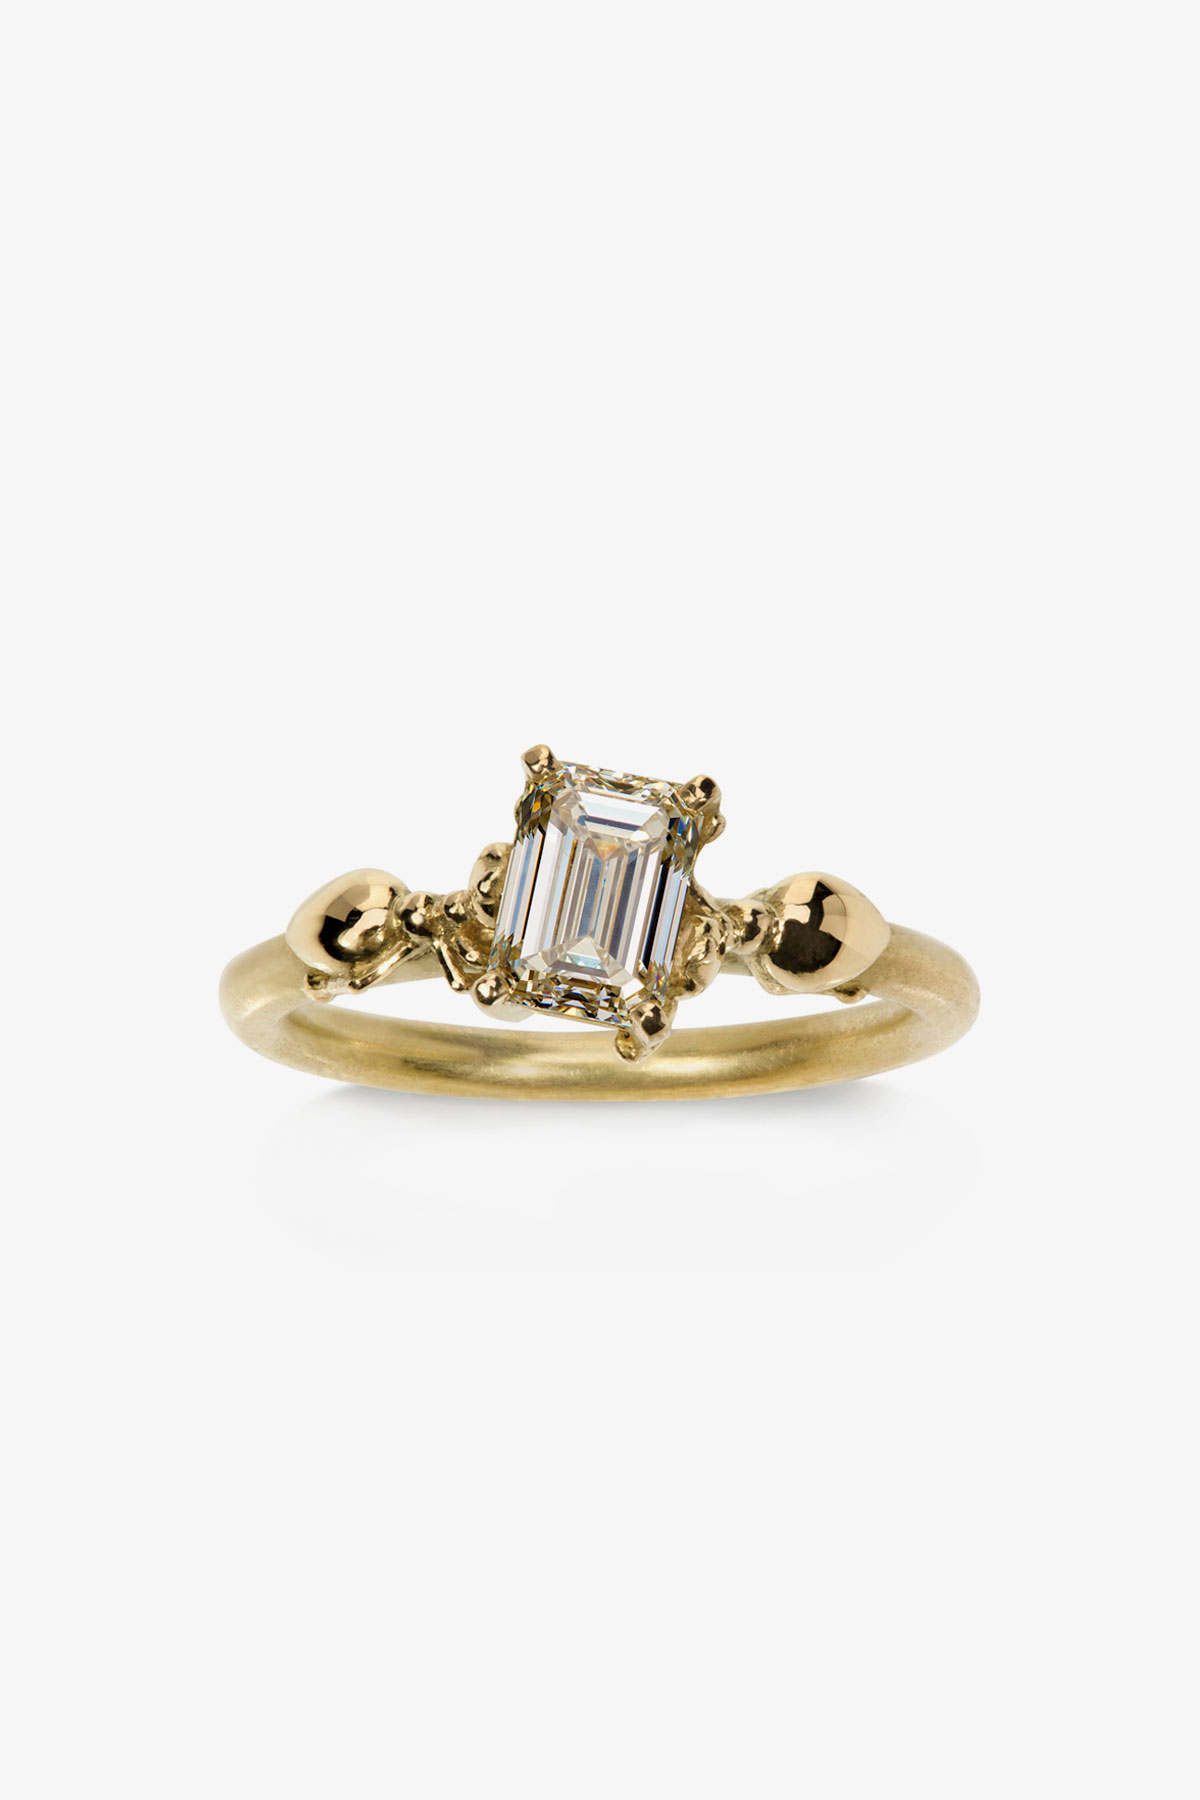 bespoke-emerald-cut-ring.jpg